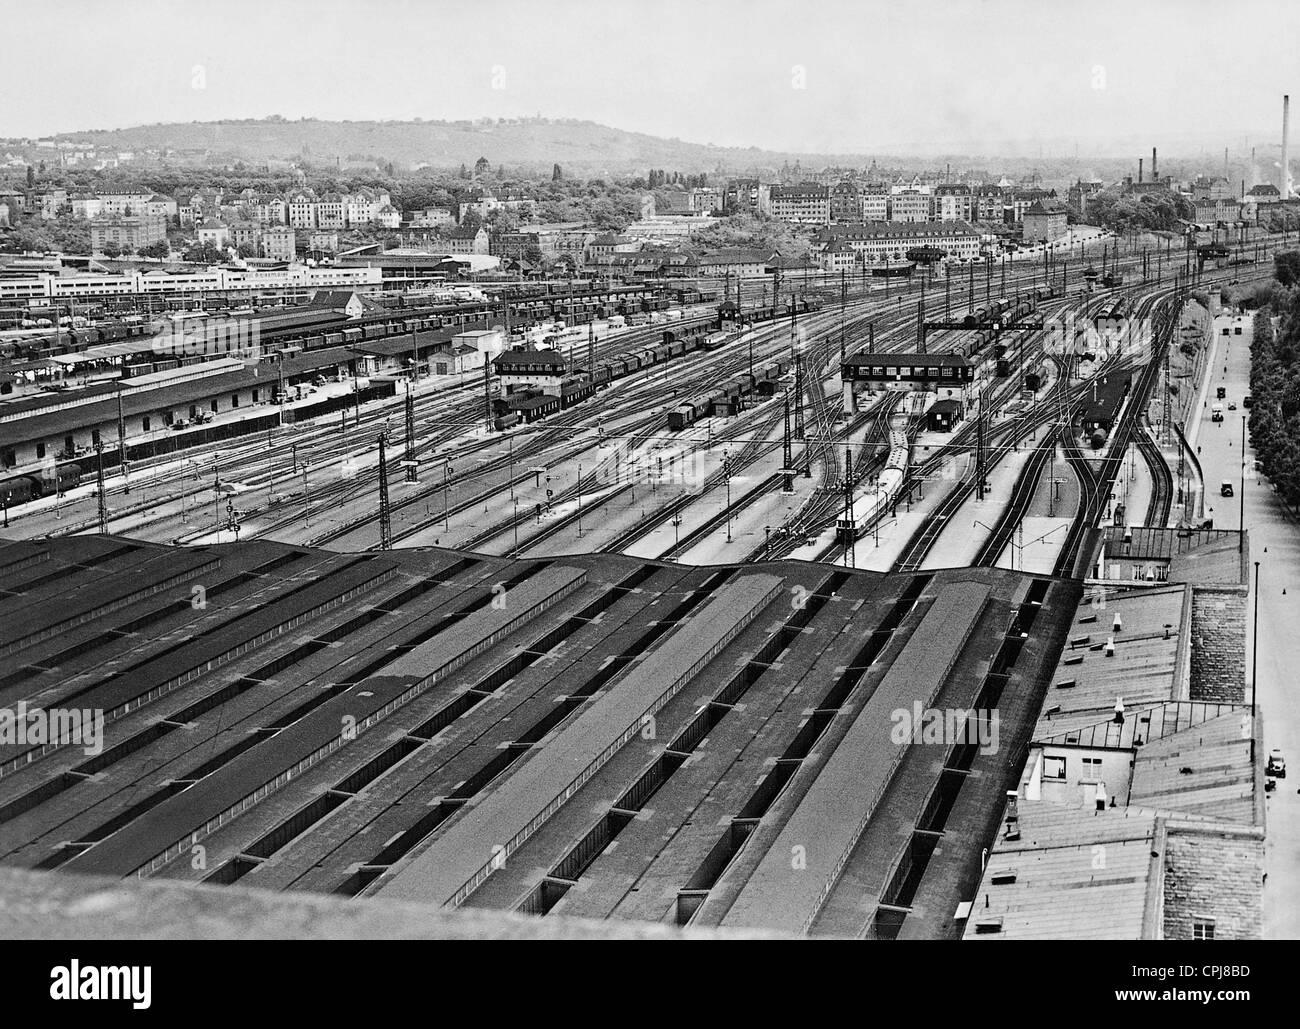 Railroad tracks of the Stuttgart Central Station - Stock Image